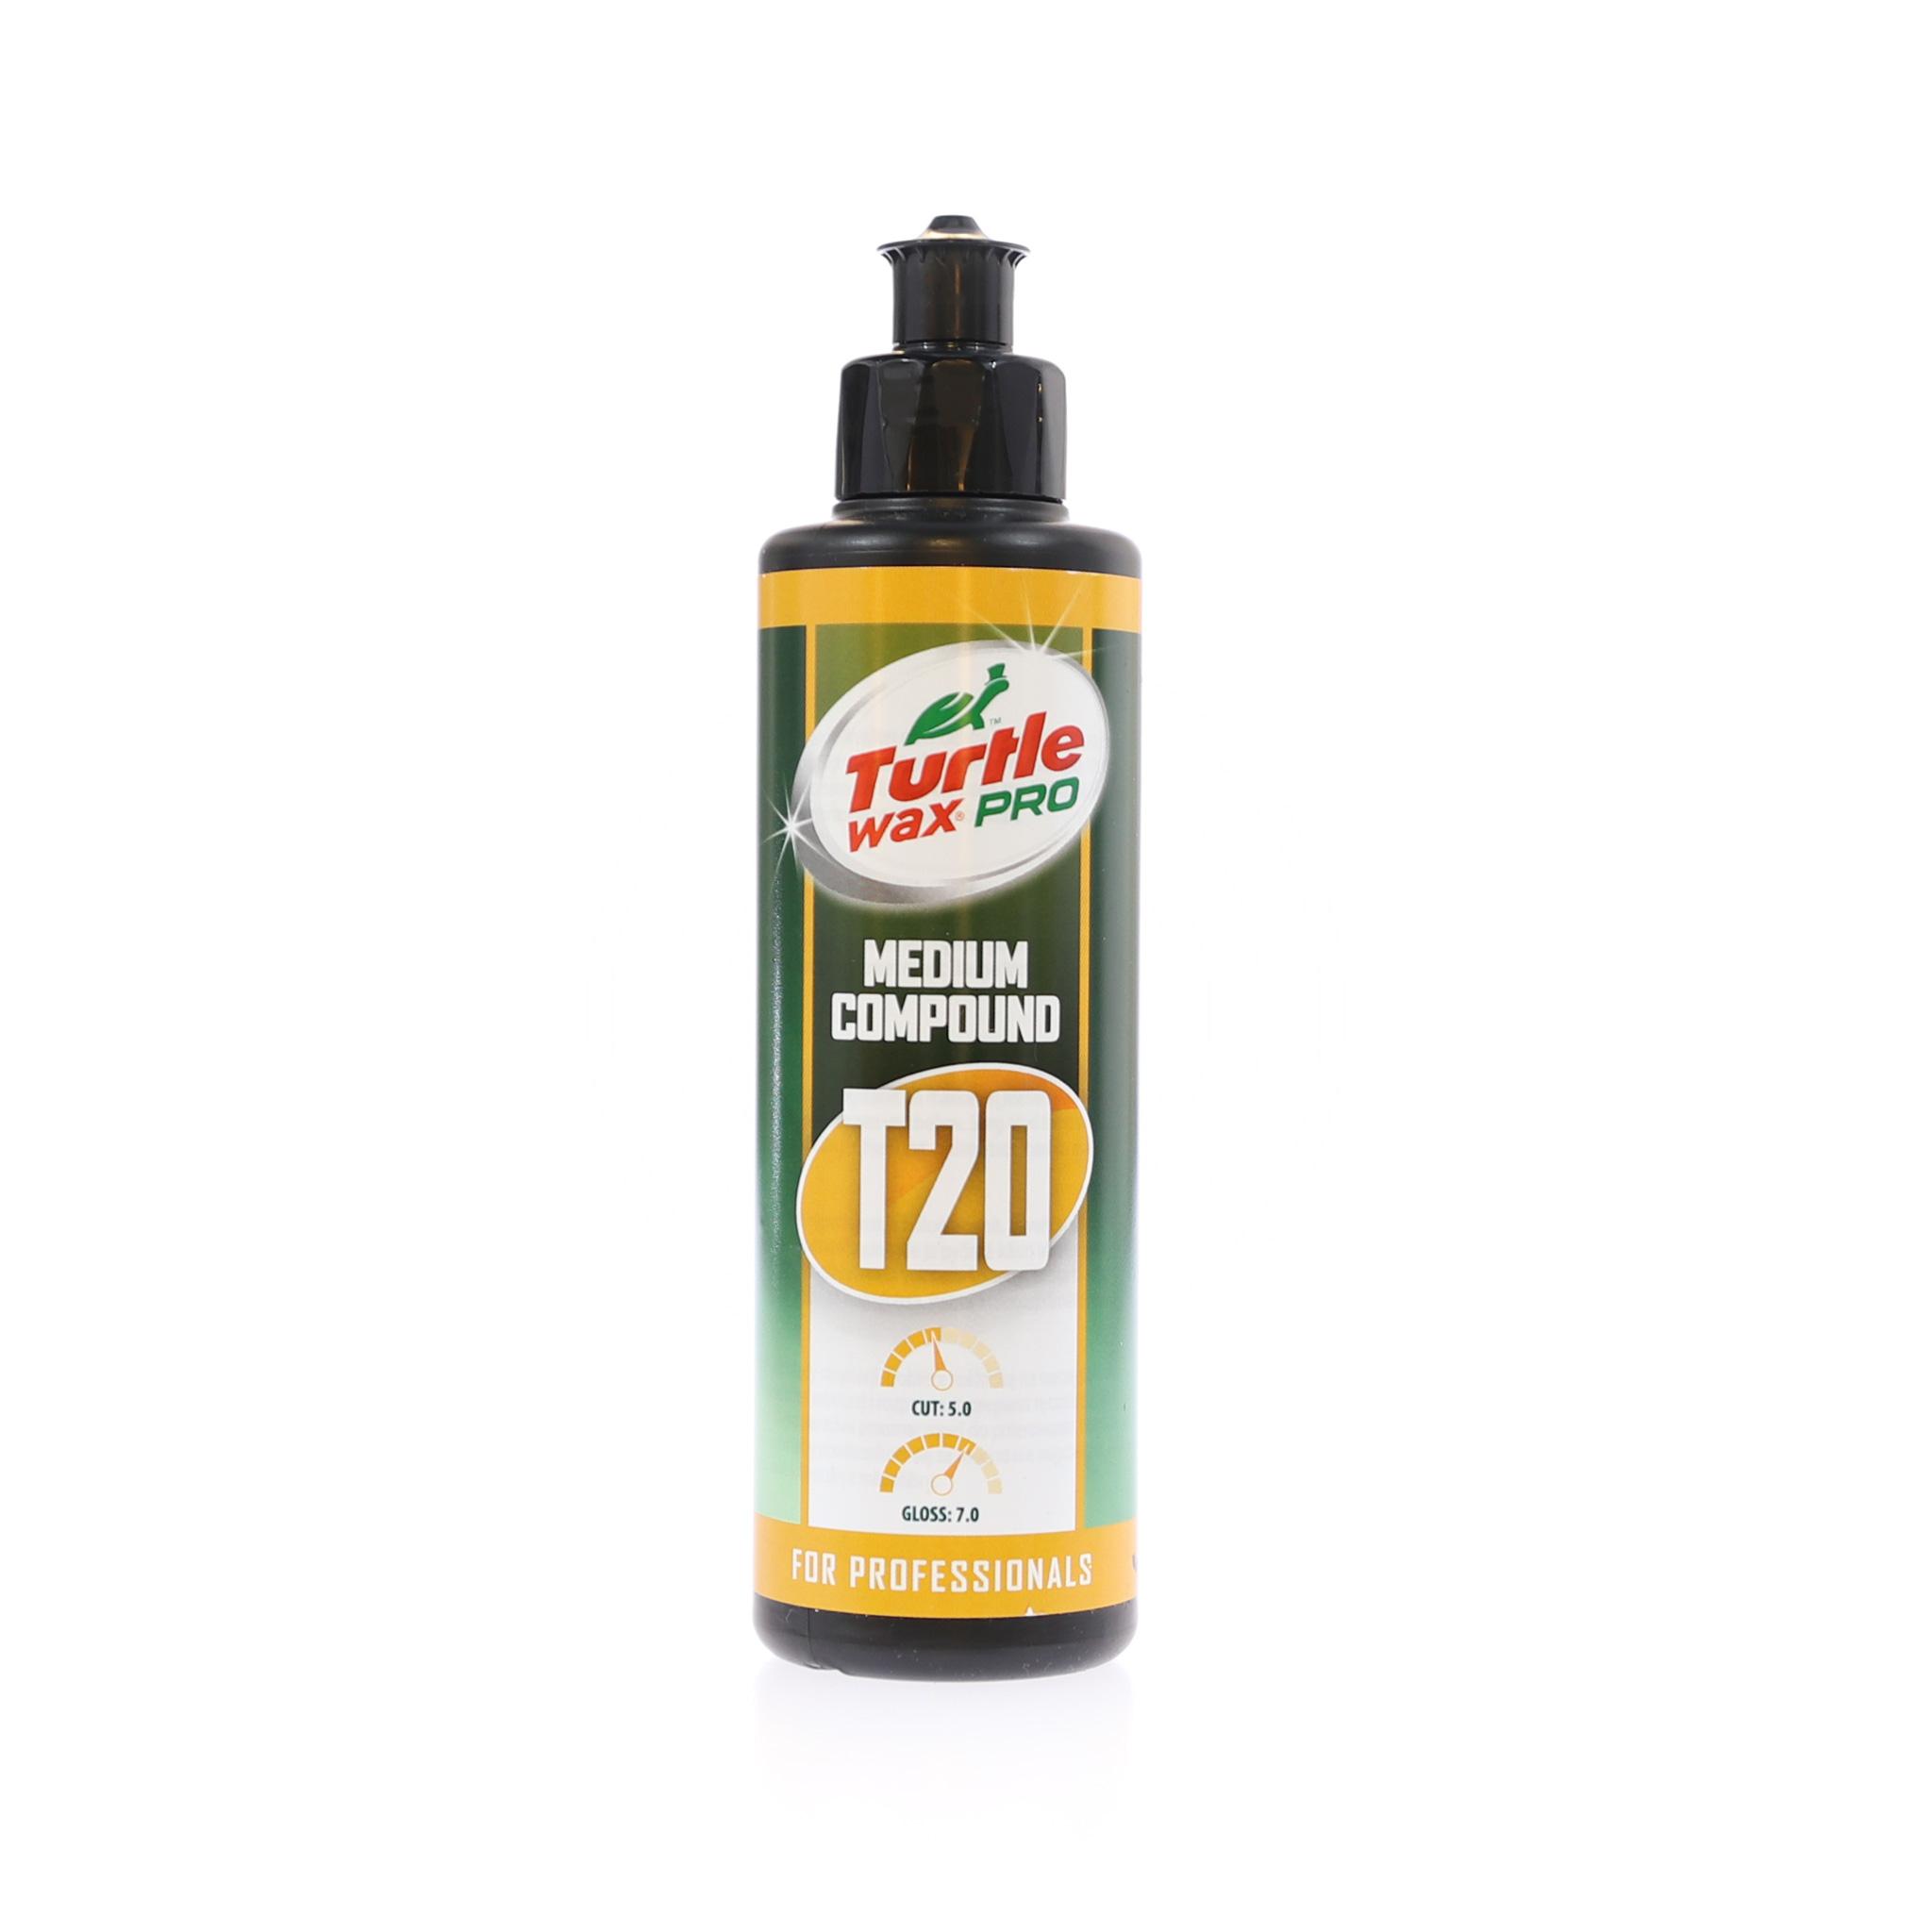 Polermedel Turtle Wax T20, Rubbing / Polishing